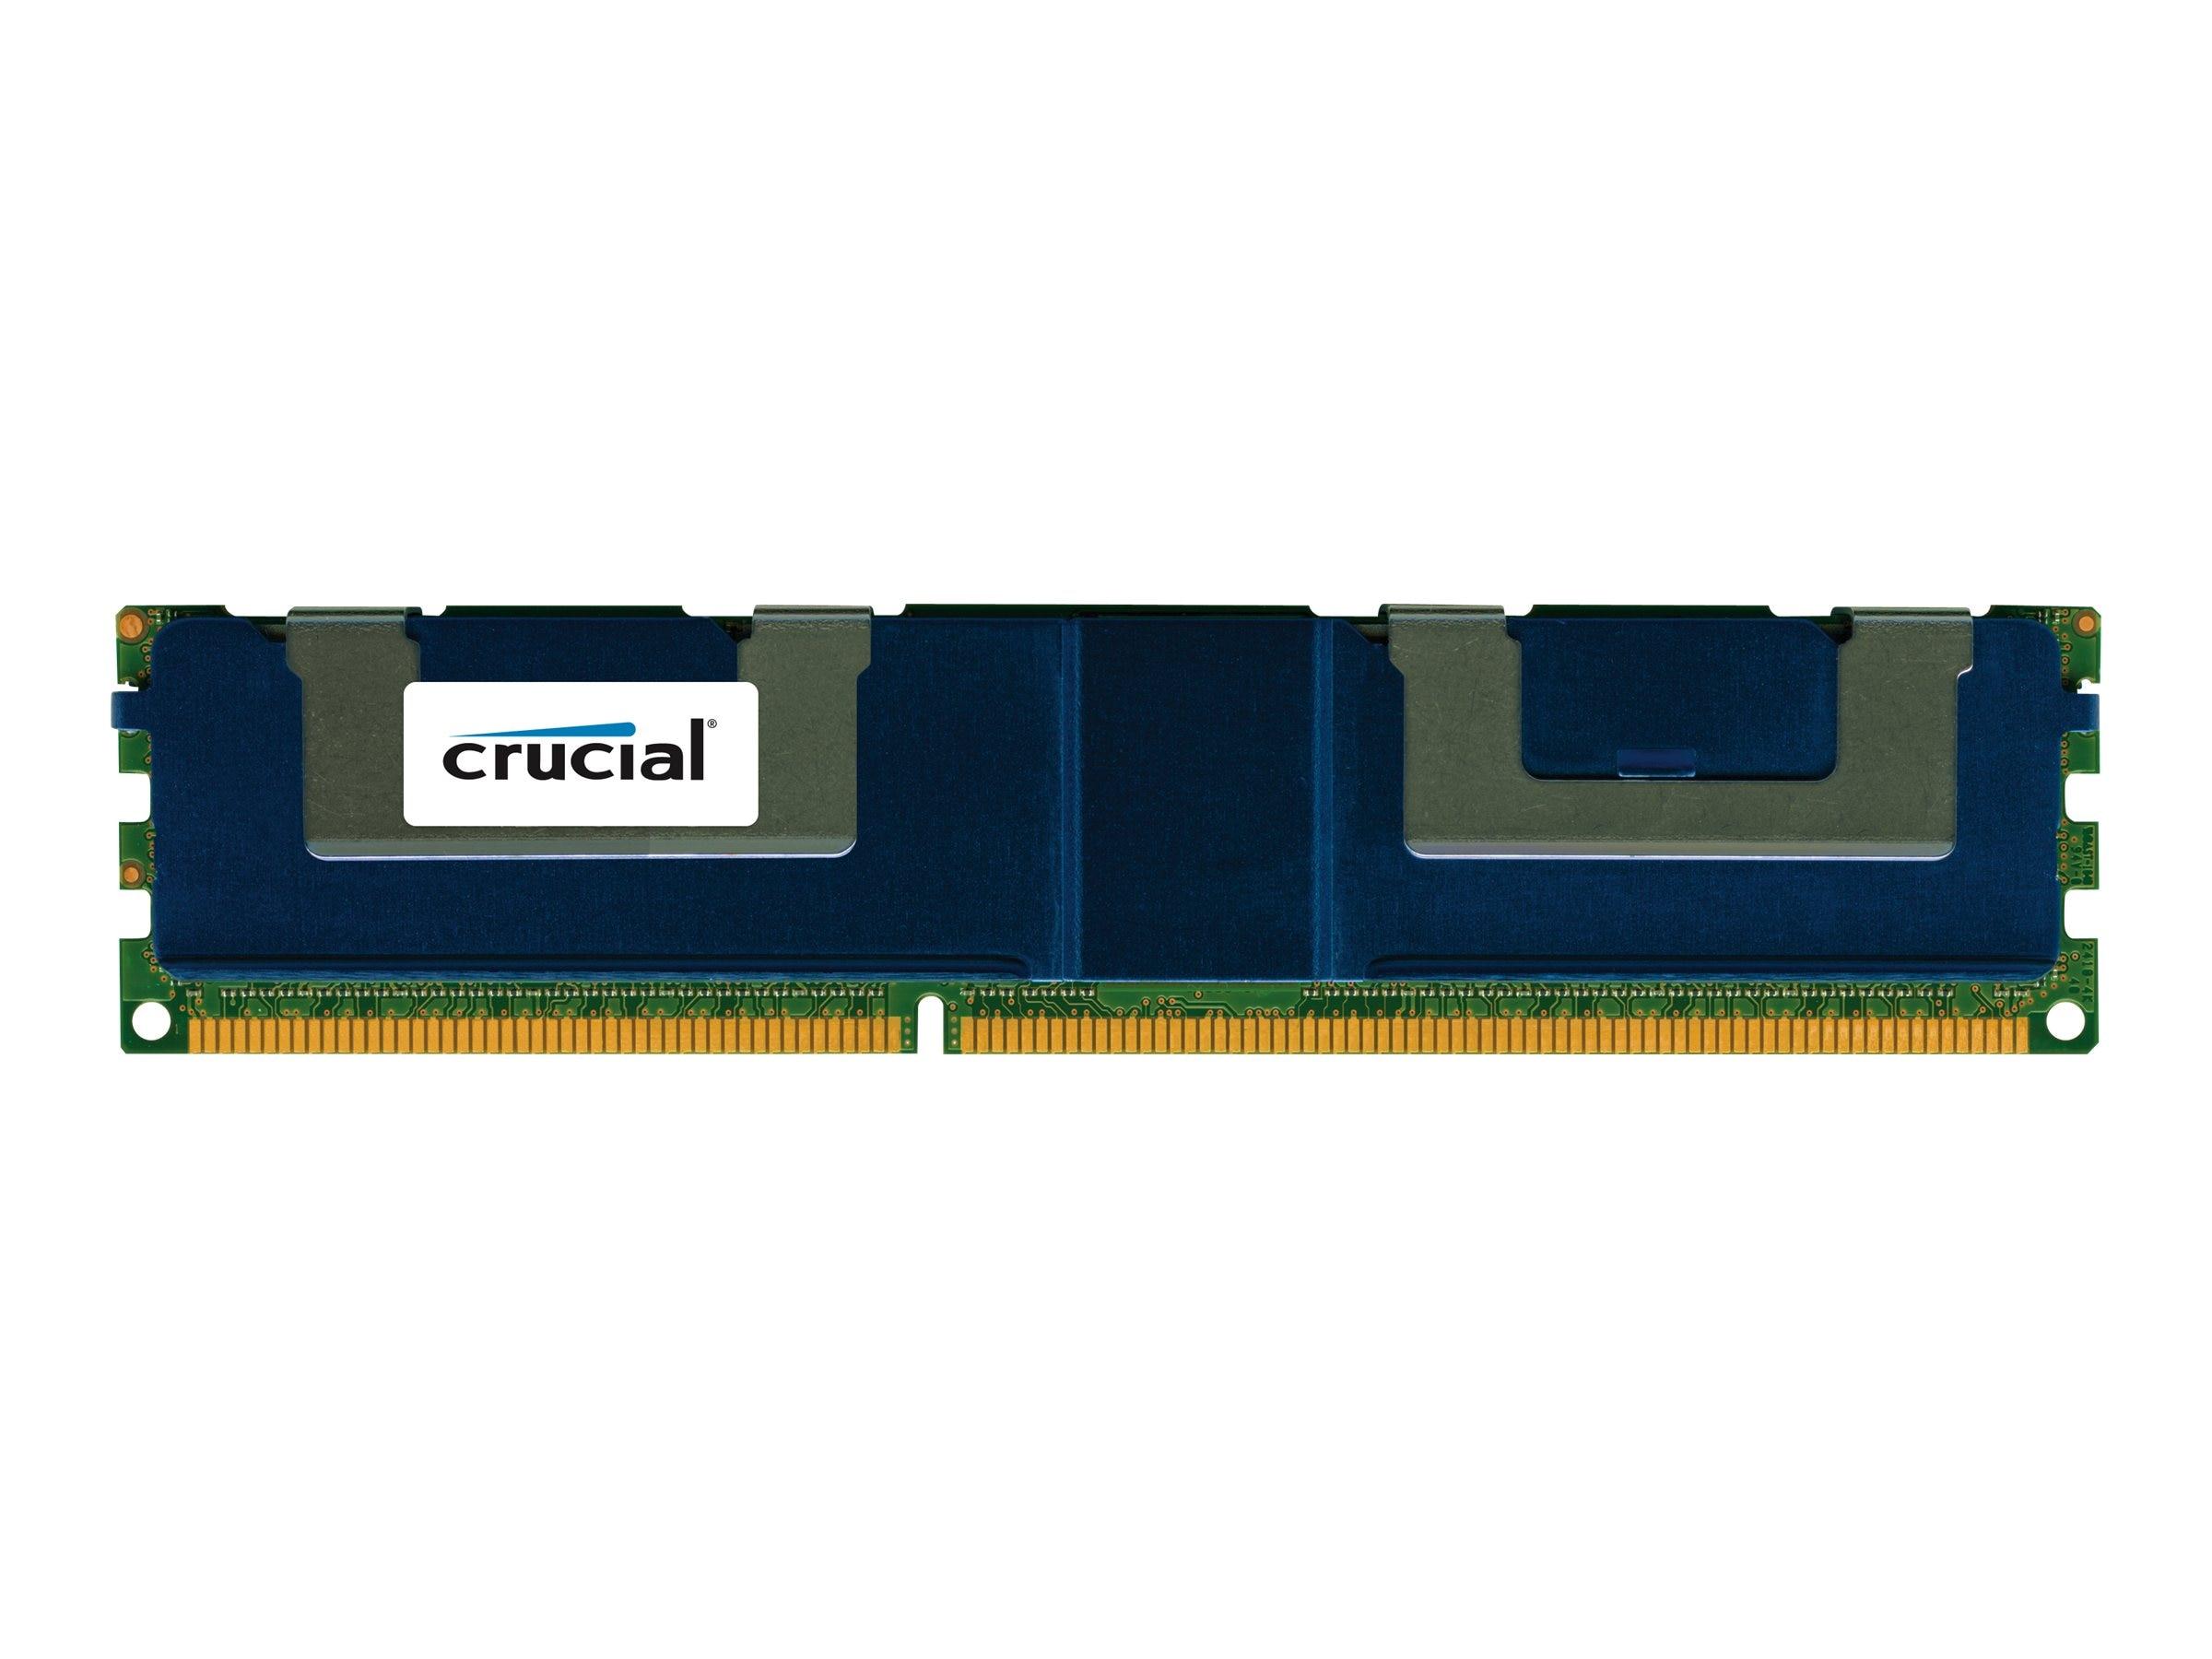 Crucial 32GB PC3-12800 240-pin DDR3 SDRAM DIMM, CT32G3ELSLQ4160B, 16737074, Memory